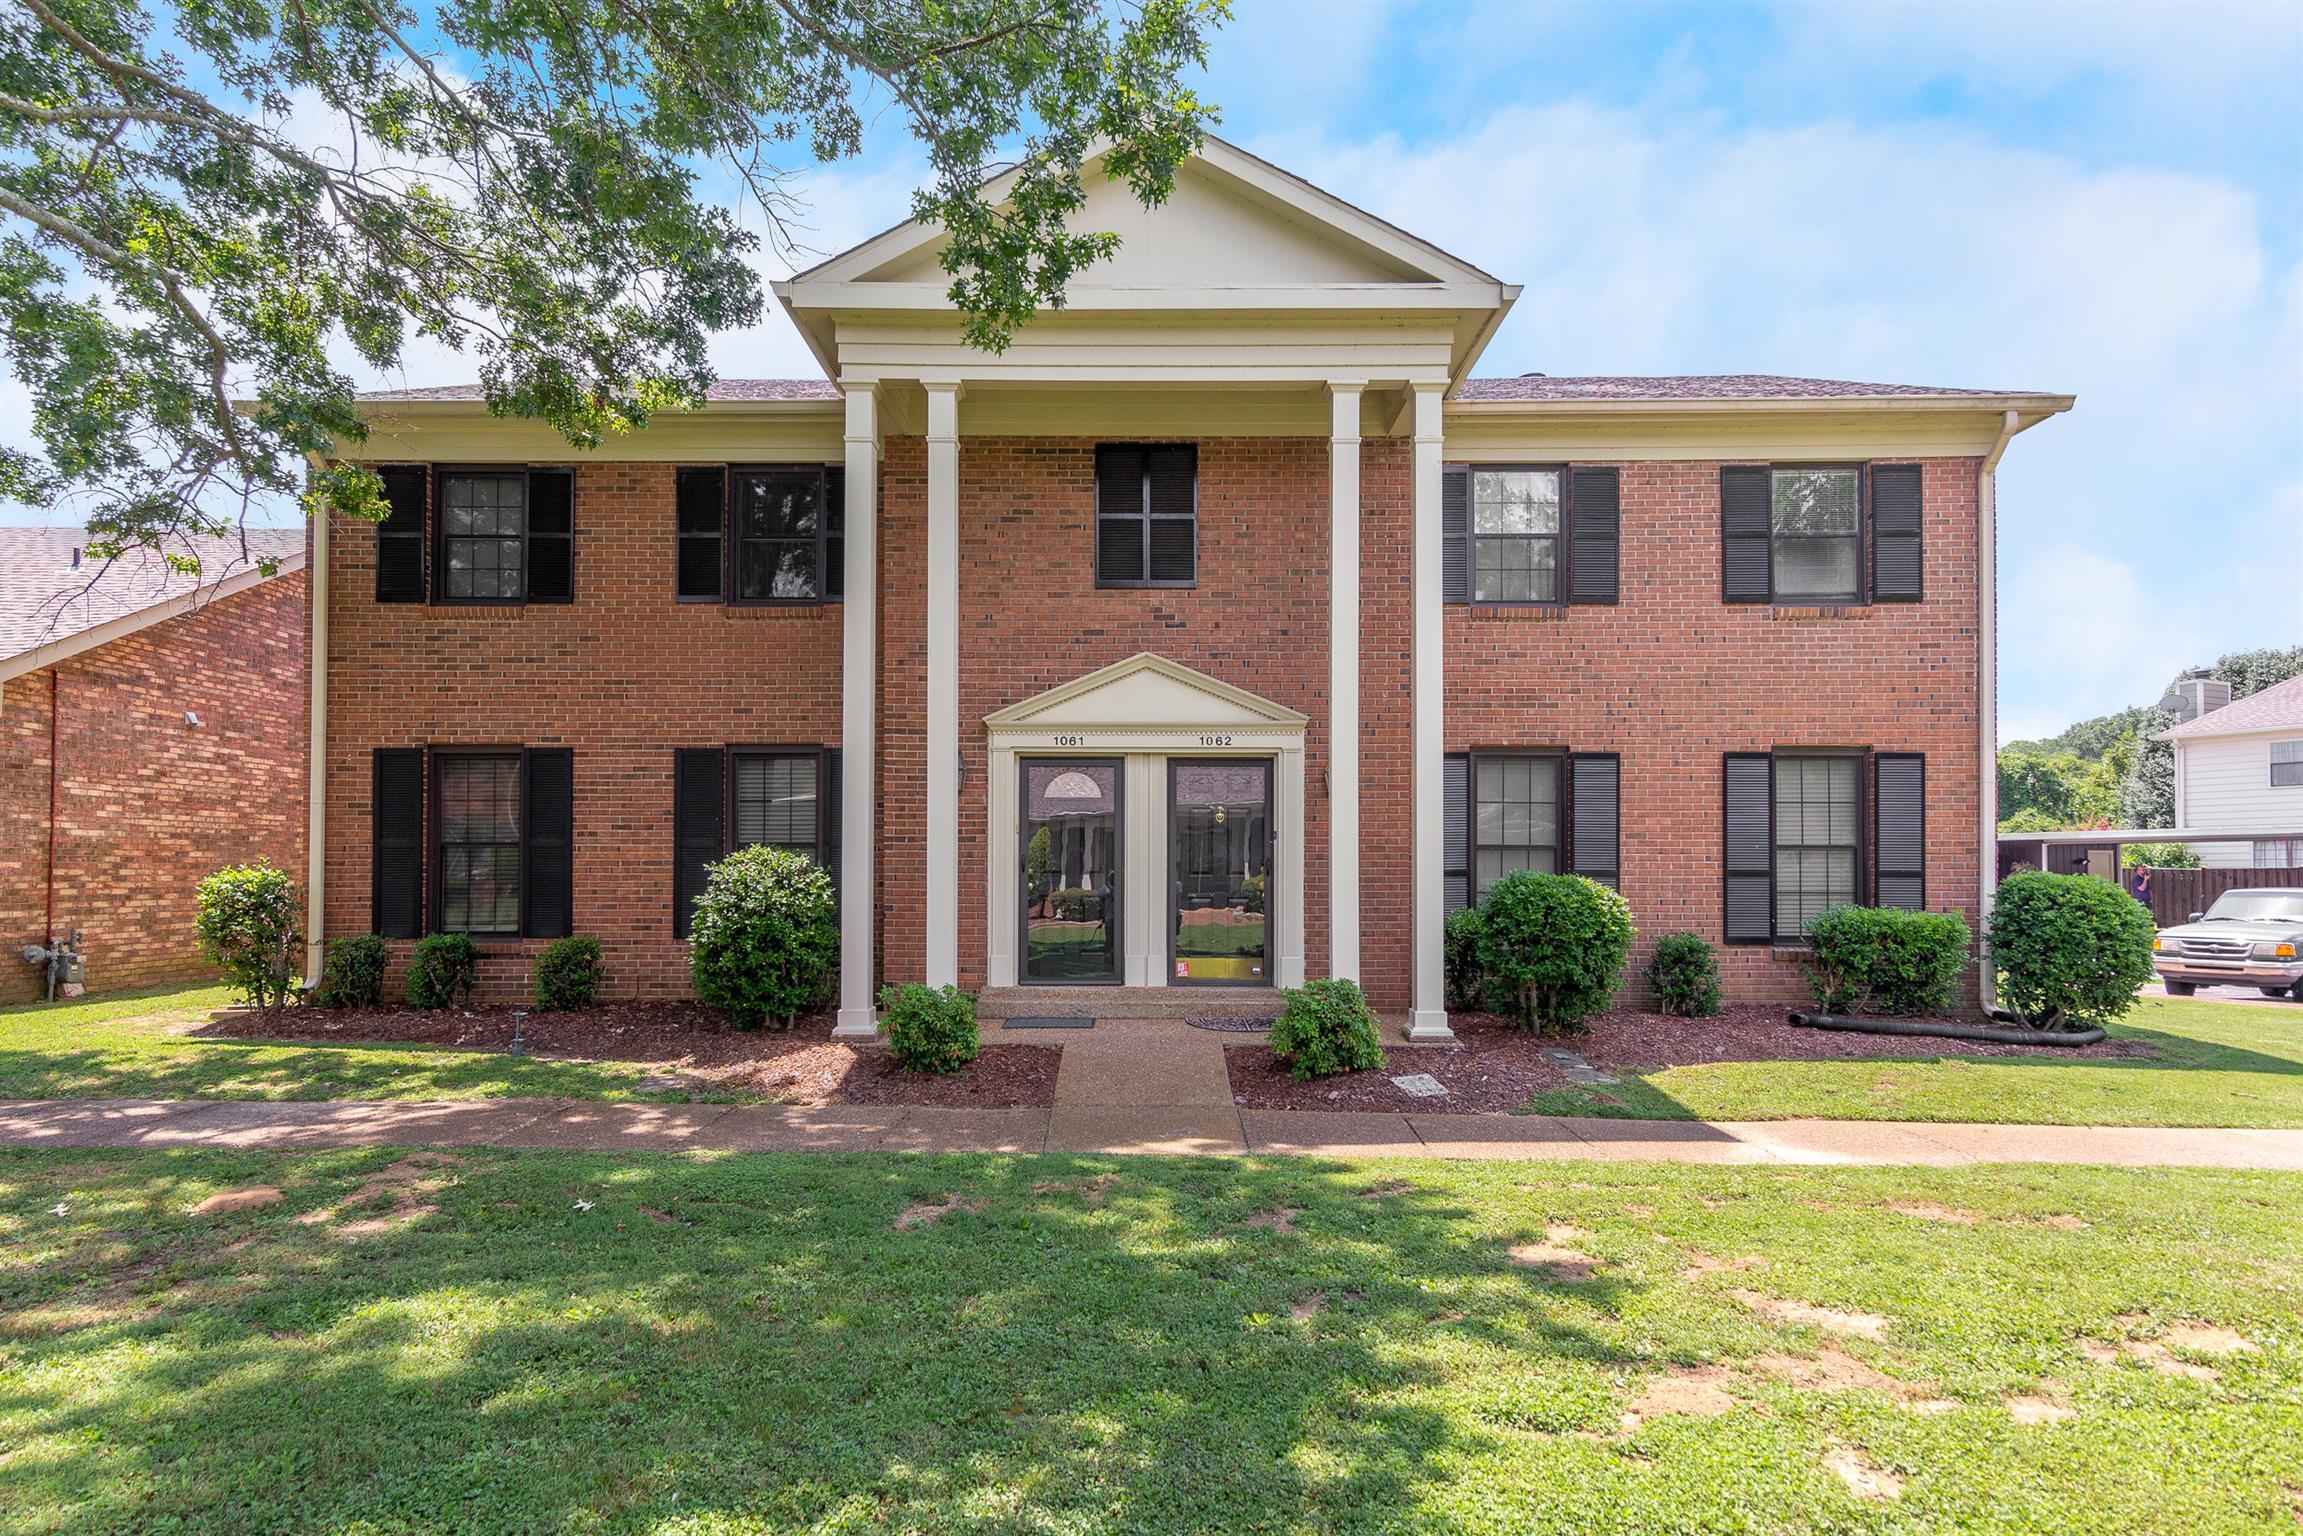 1061 General George Patton Rd, Nashville, TN 37221 - Nashville, TN real estate listing